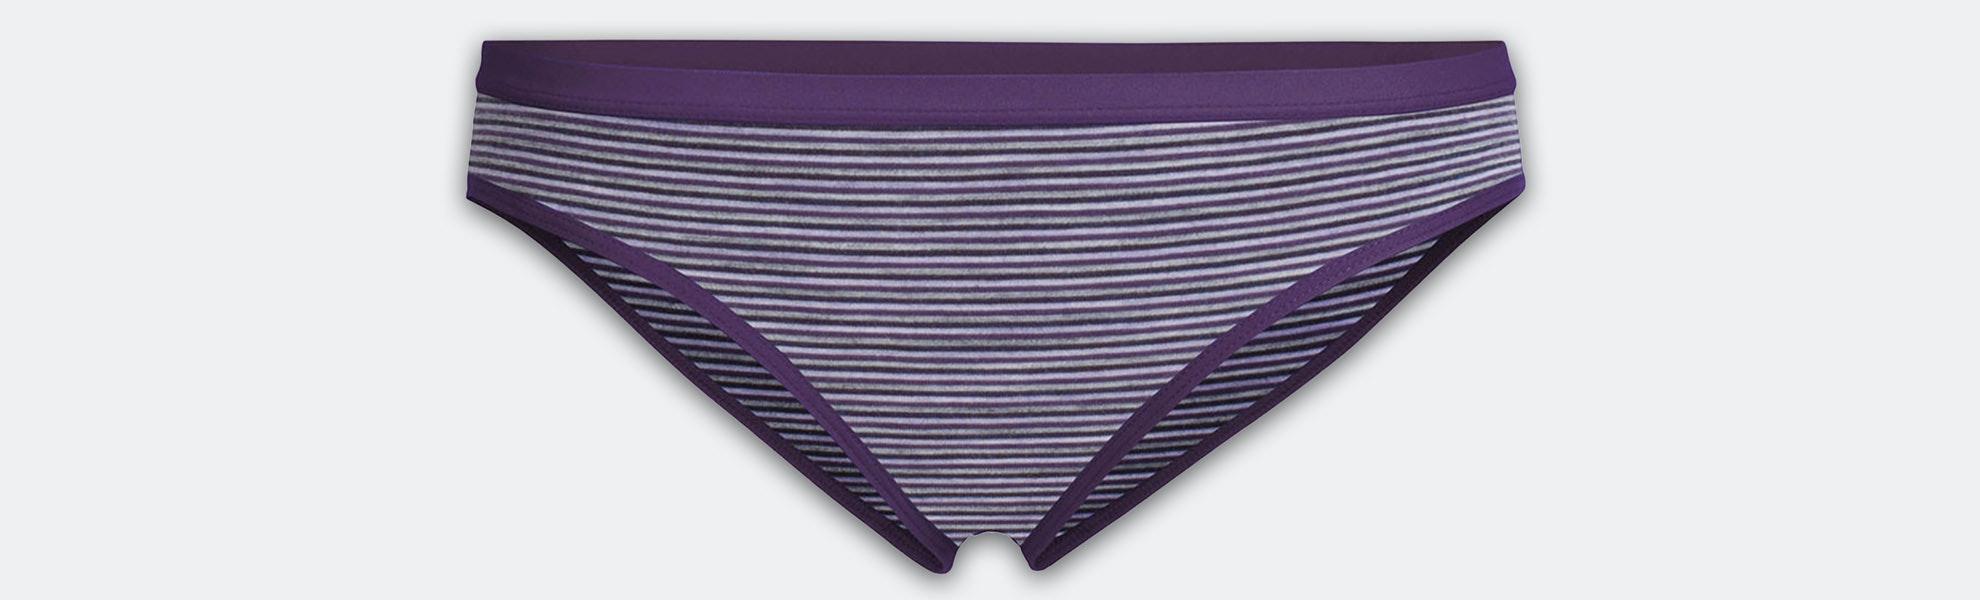 Closeout: Icebreaker Women's Underwear & Tops